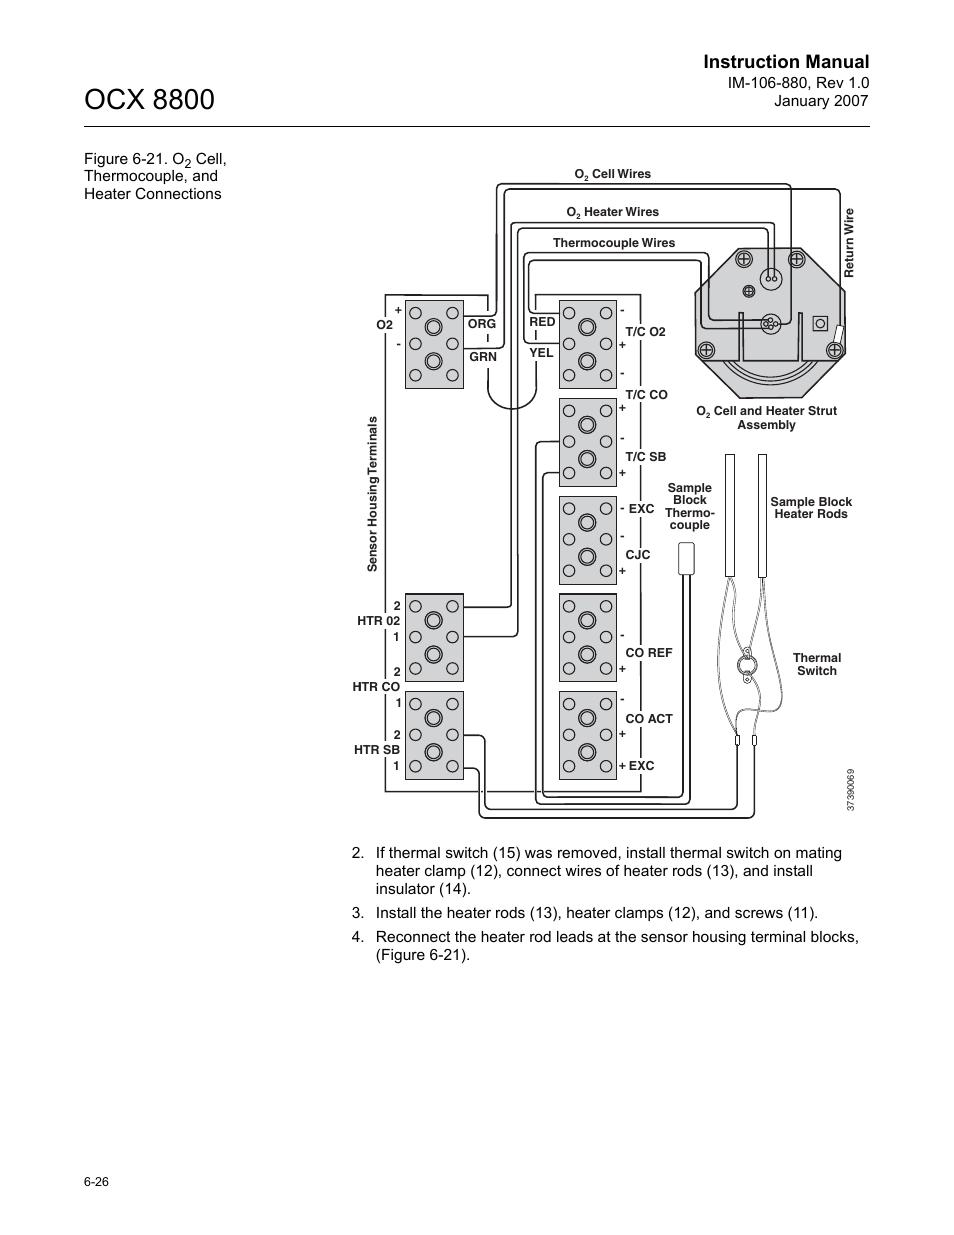 ocx 8800, instruction manual | emerson rosemount ocx 8800 user manual |  page 88 / 164